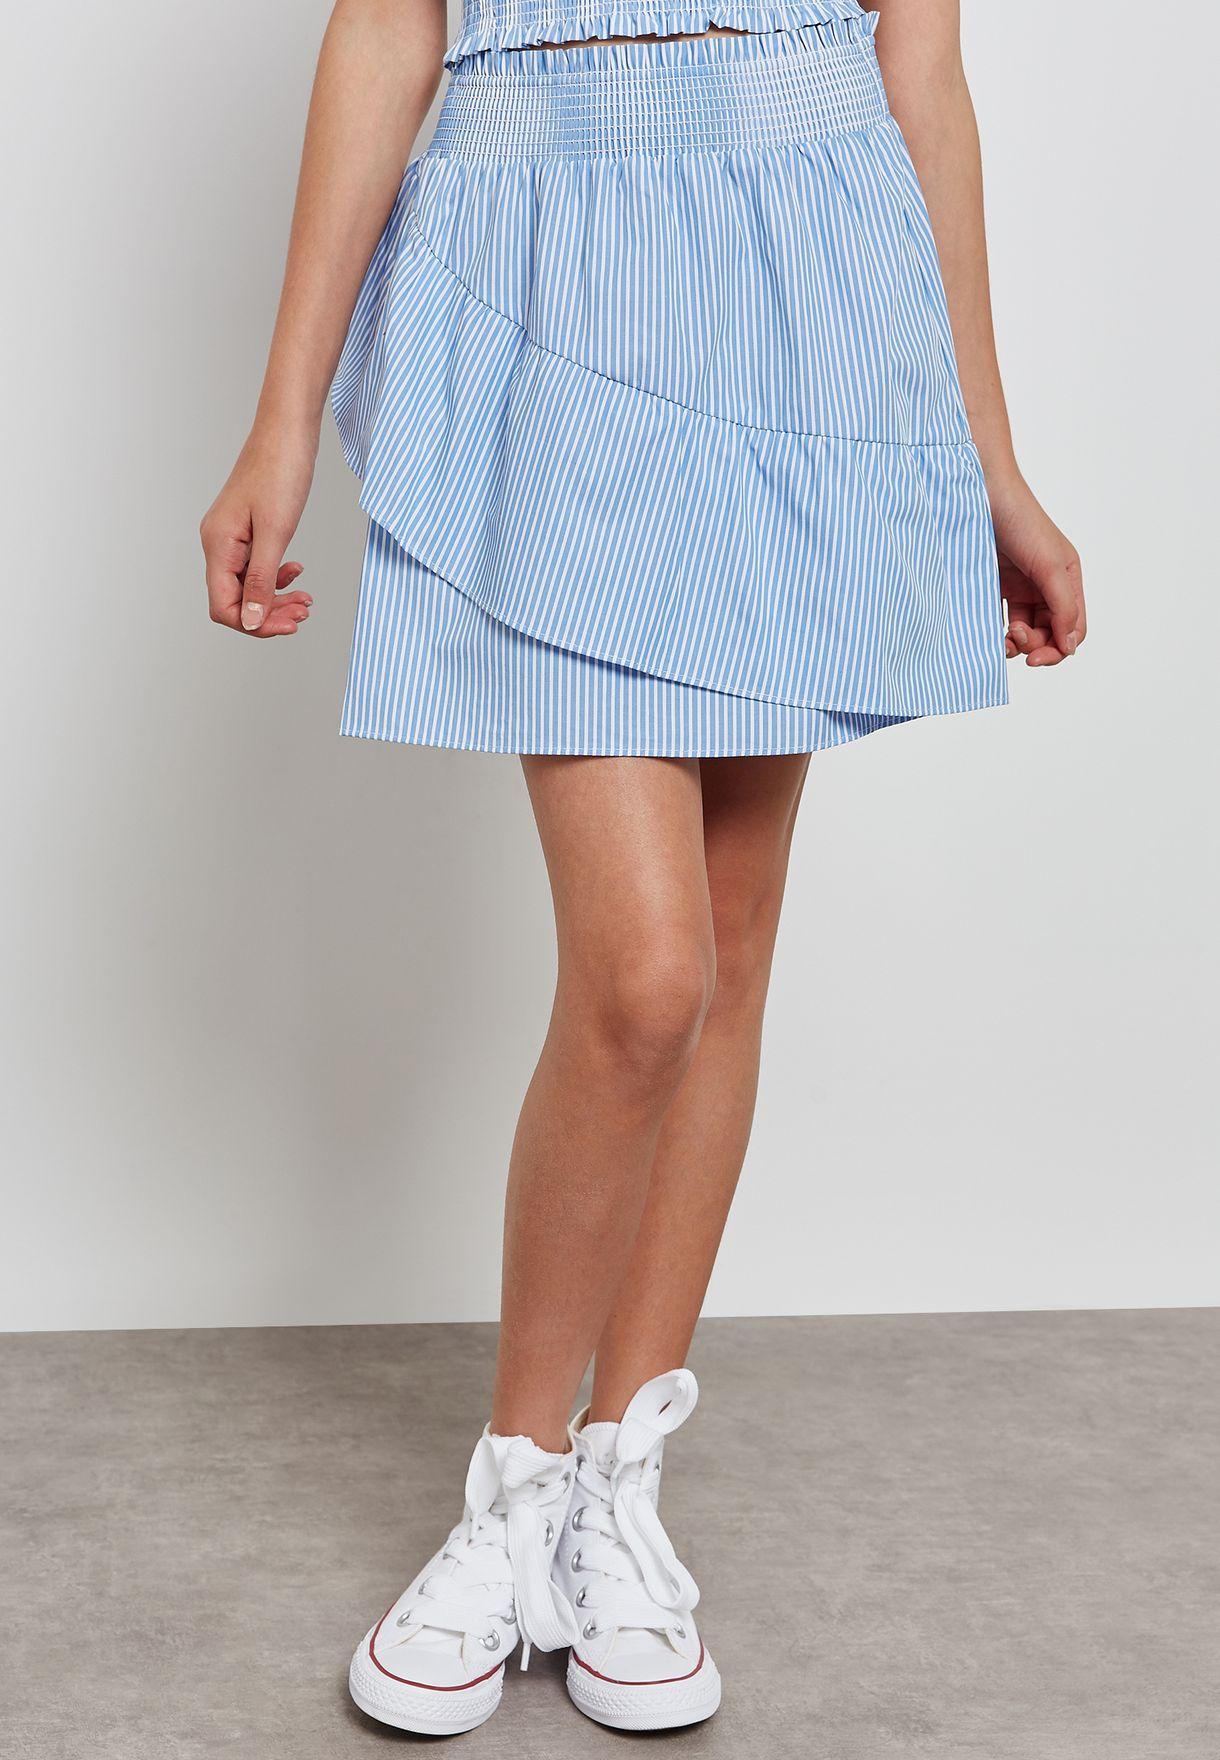 ekineges Pretty Skirt (Teen) - S60